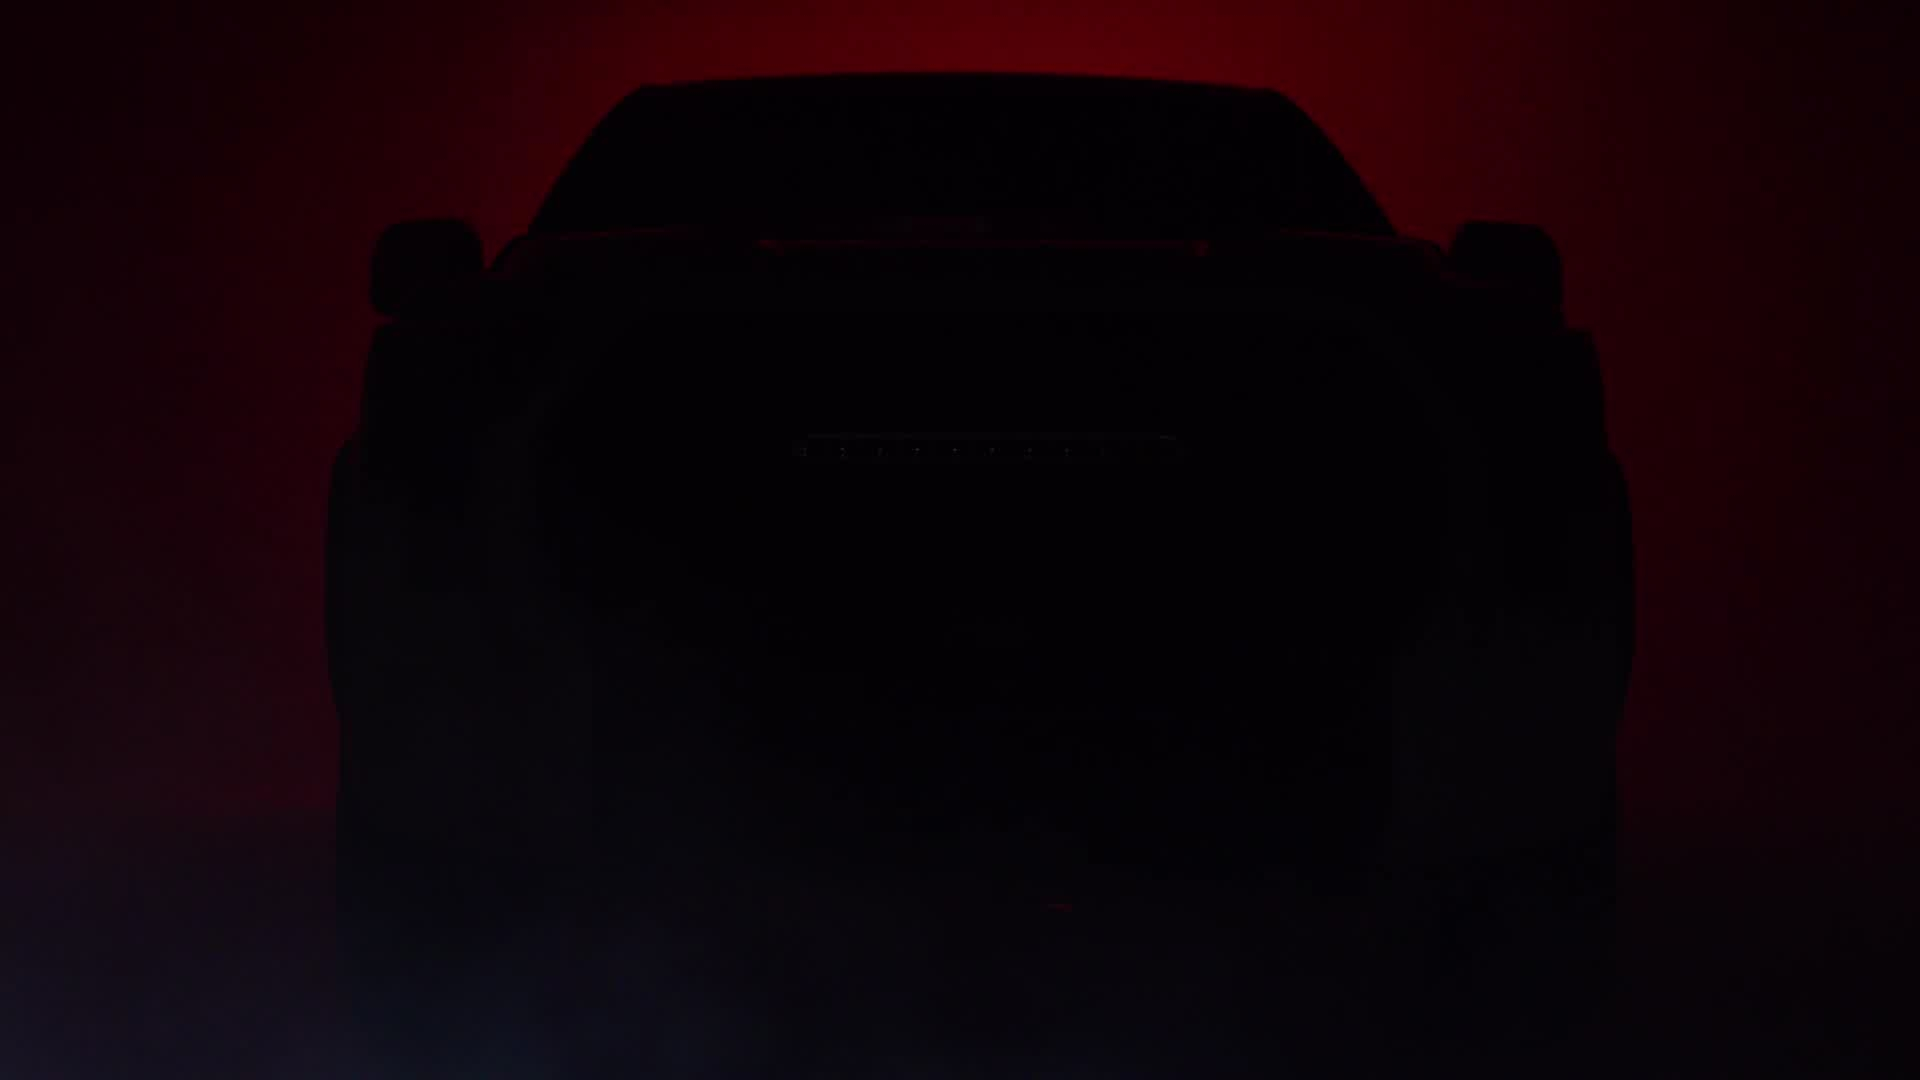 2022_Tundra_Teaser_01_Video